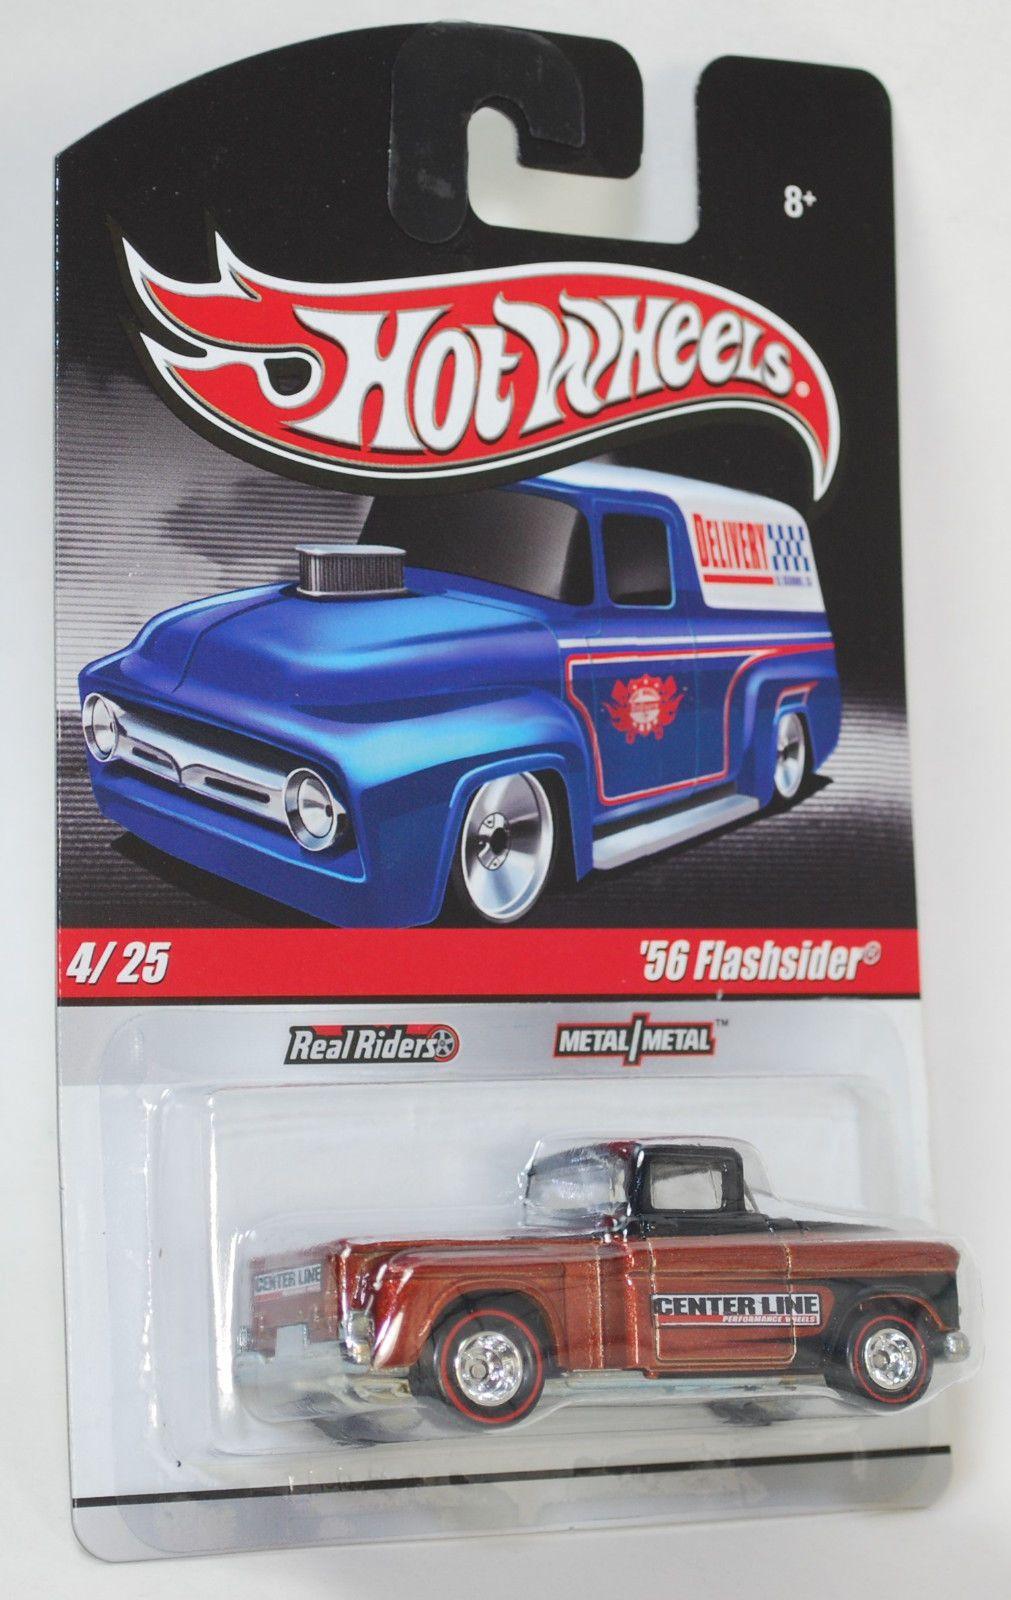 Hot Wheels Delivery Slick Rides Custom 56 Flashsider REAL RIDERS 1:64